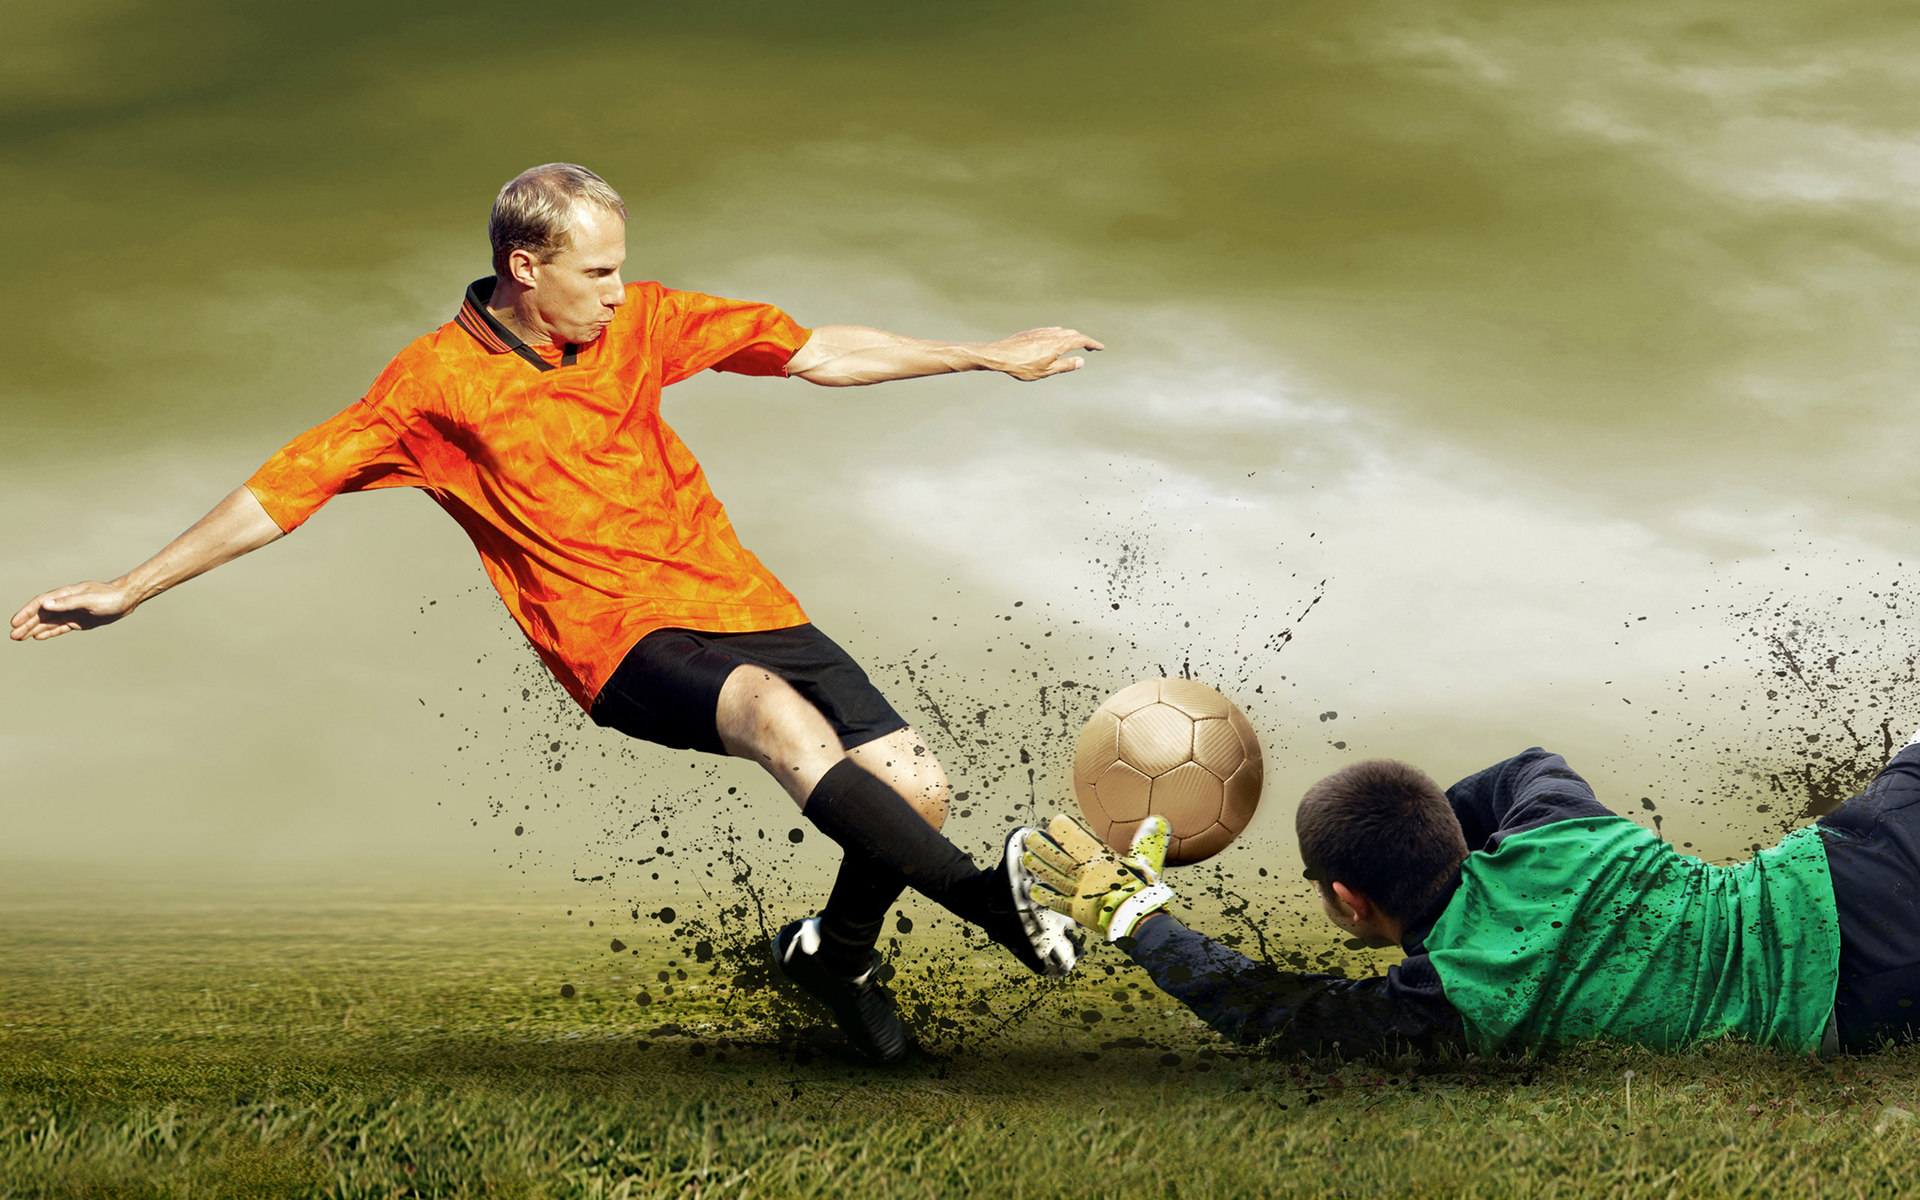 Soccer Players Wallpapers 3d Soccer Wallpaper 1920x1200